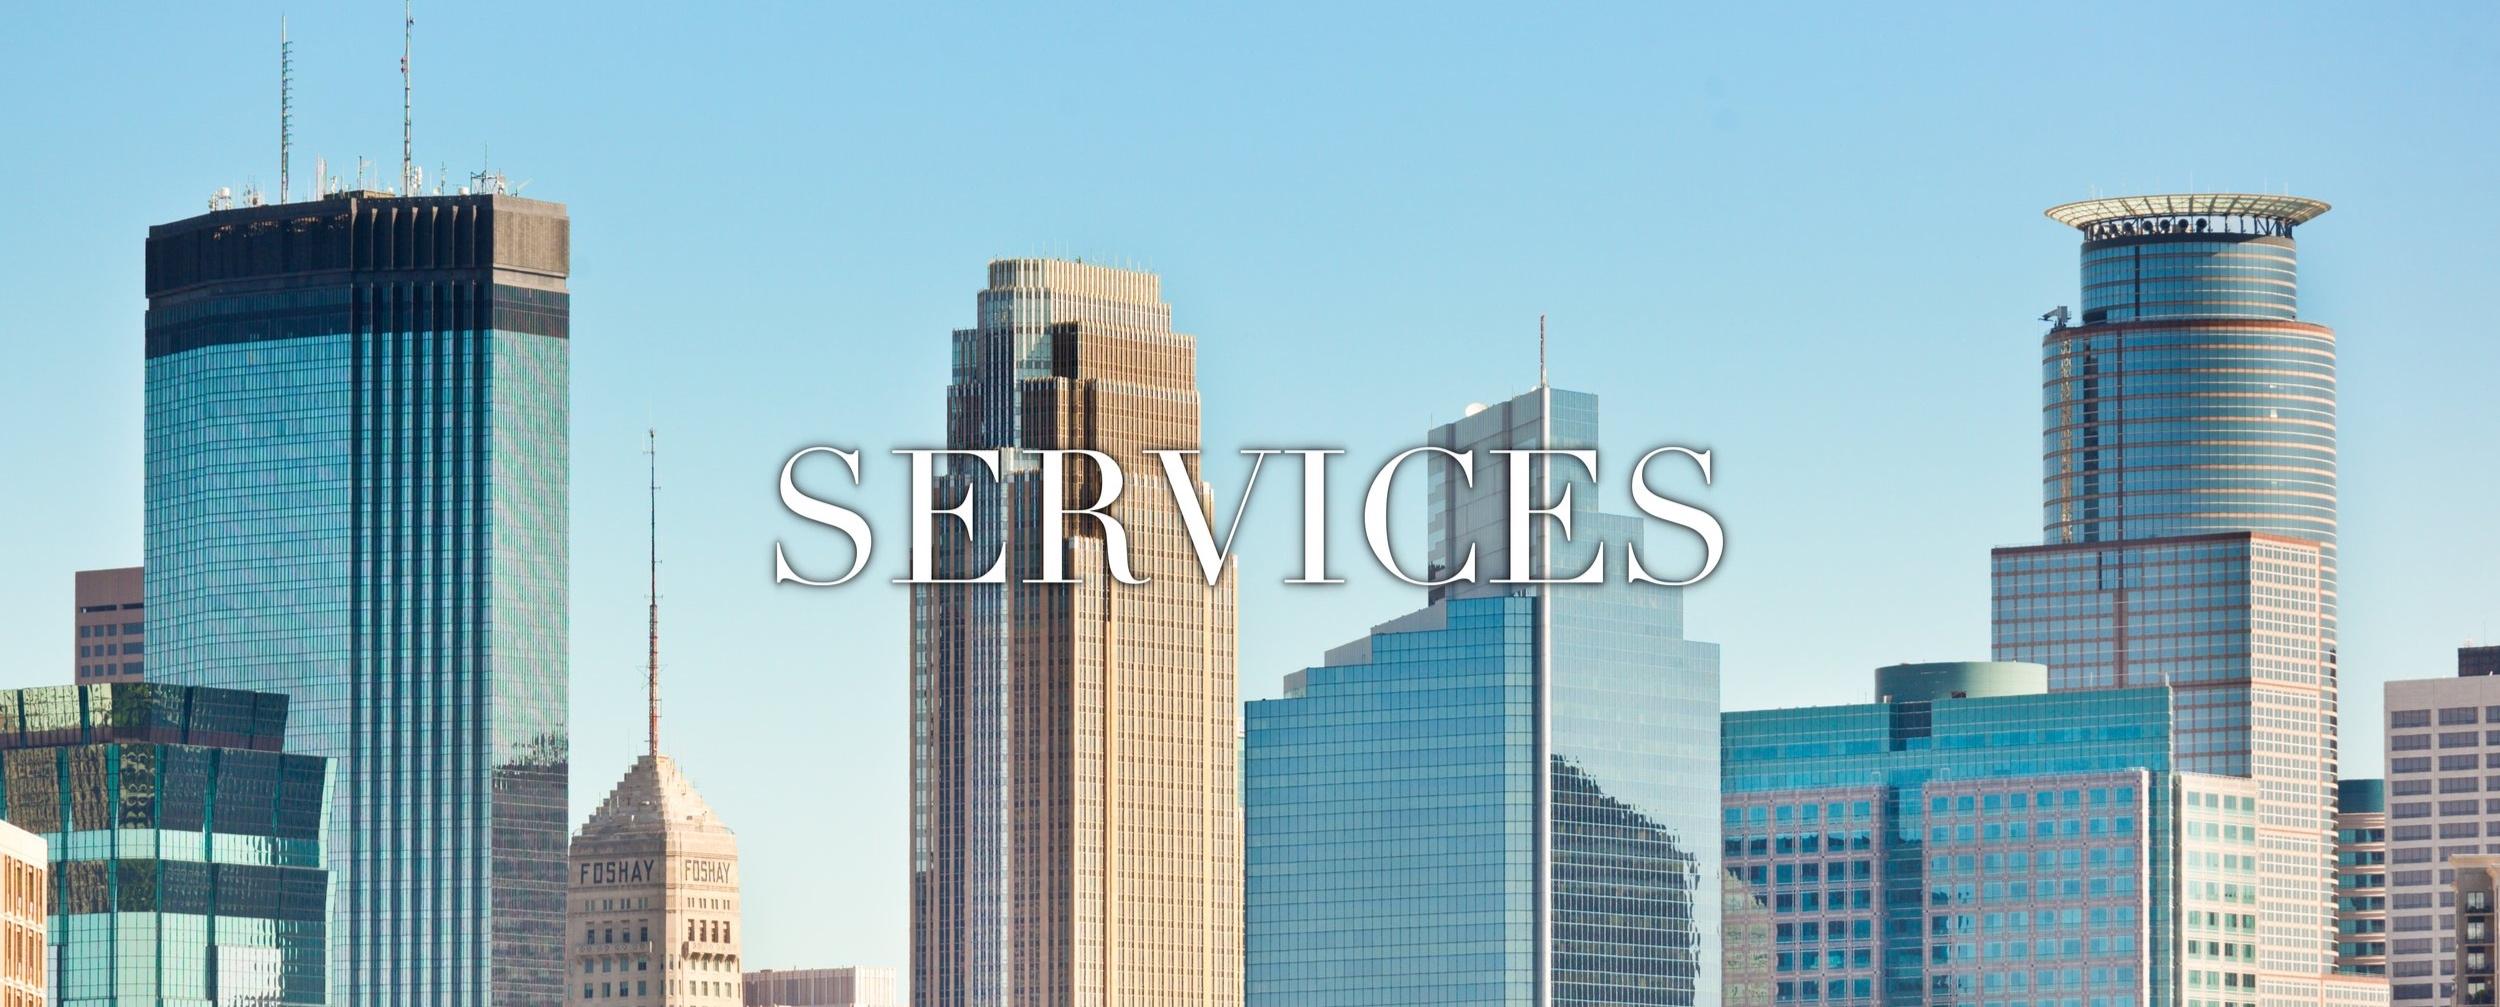 Patrick Illies. Services.